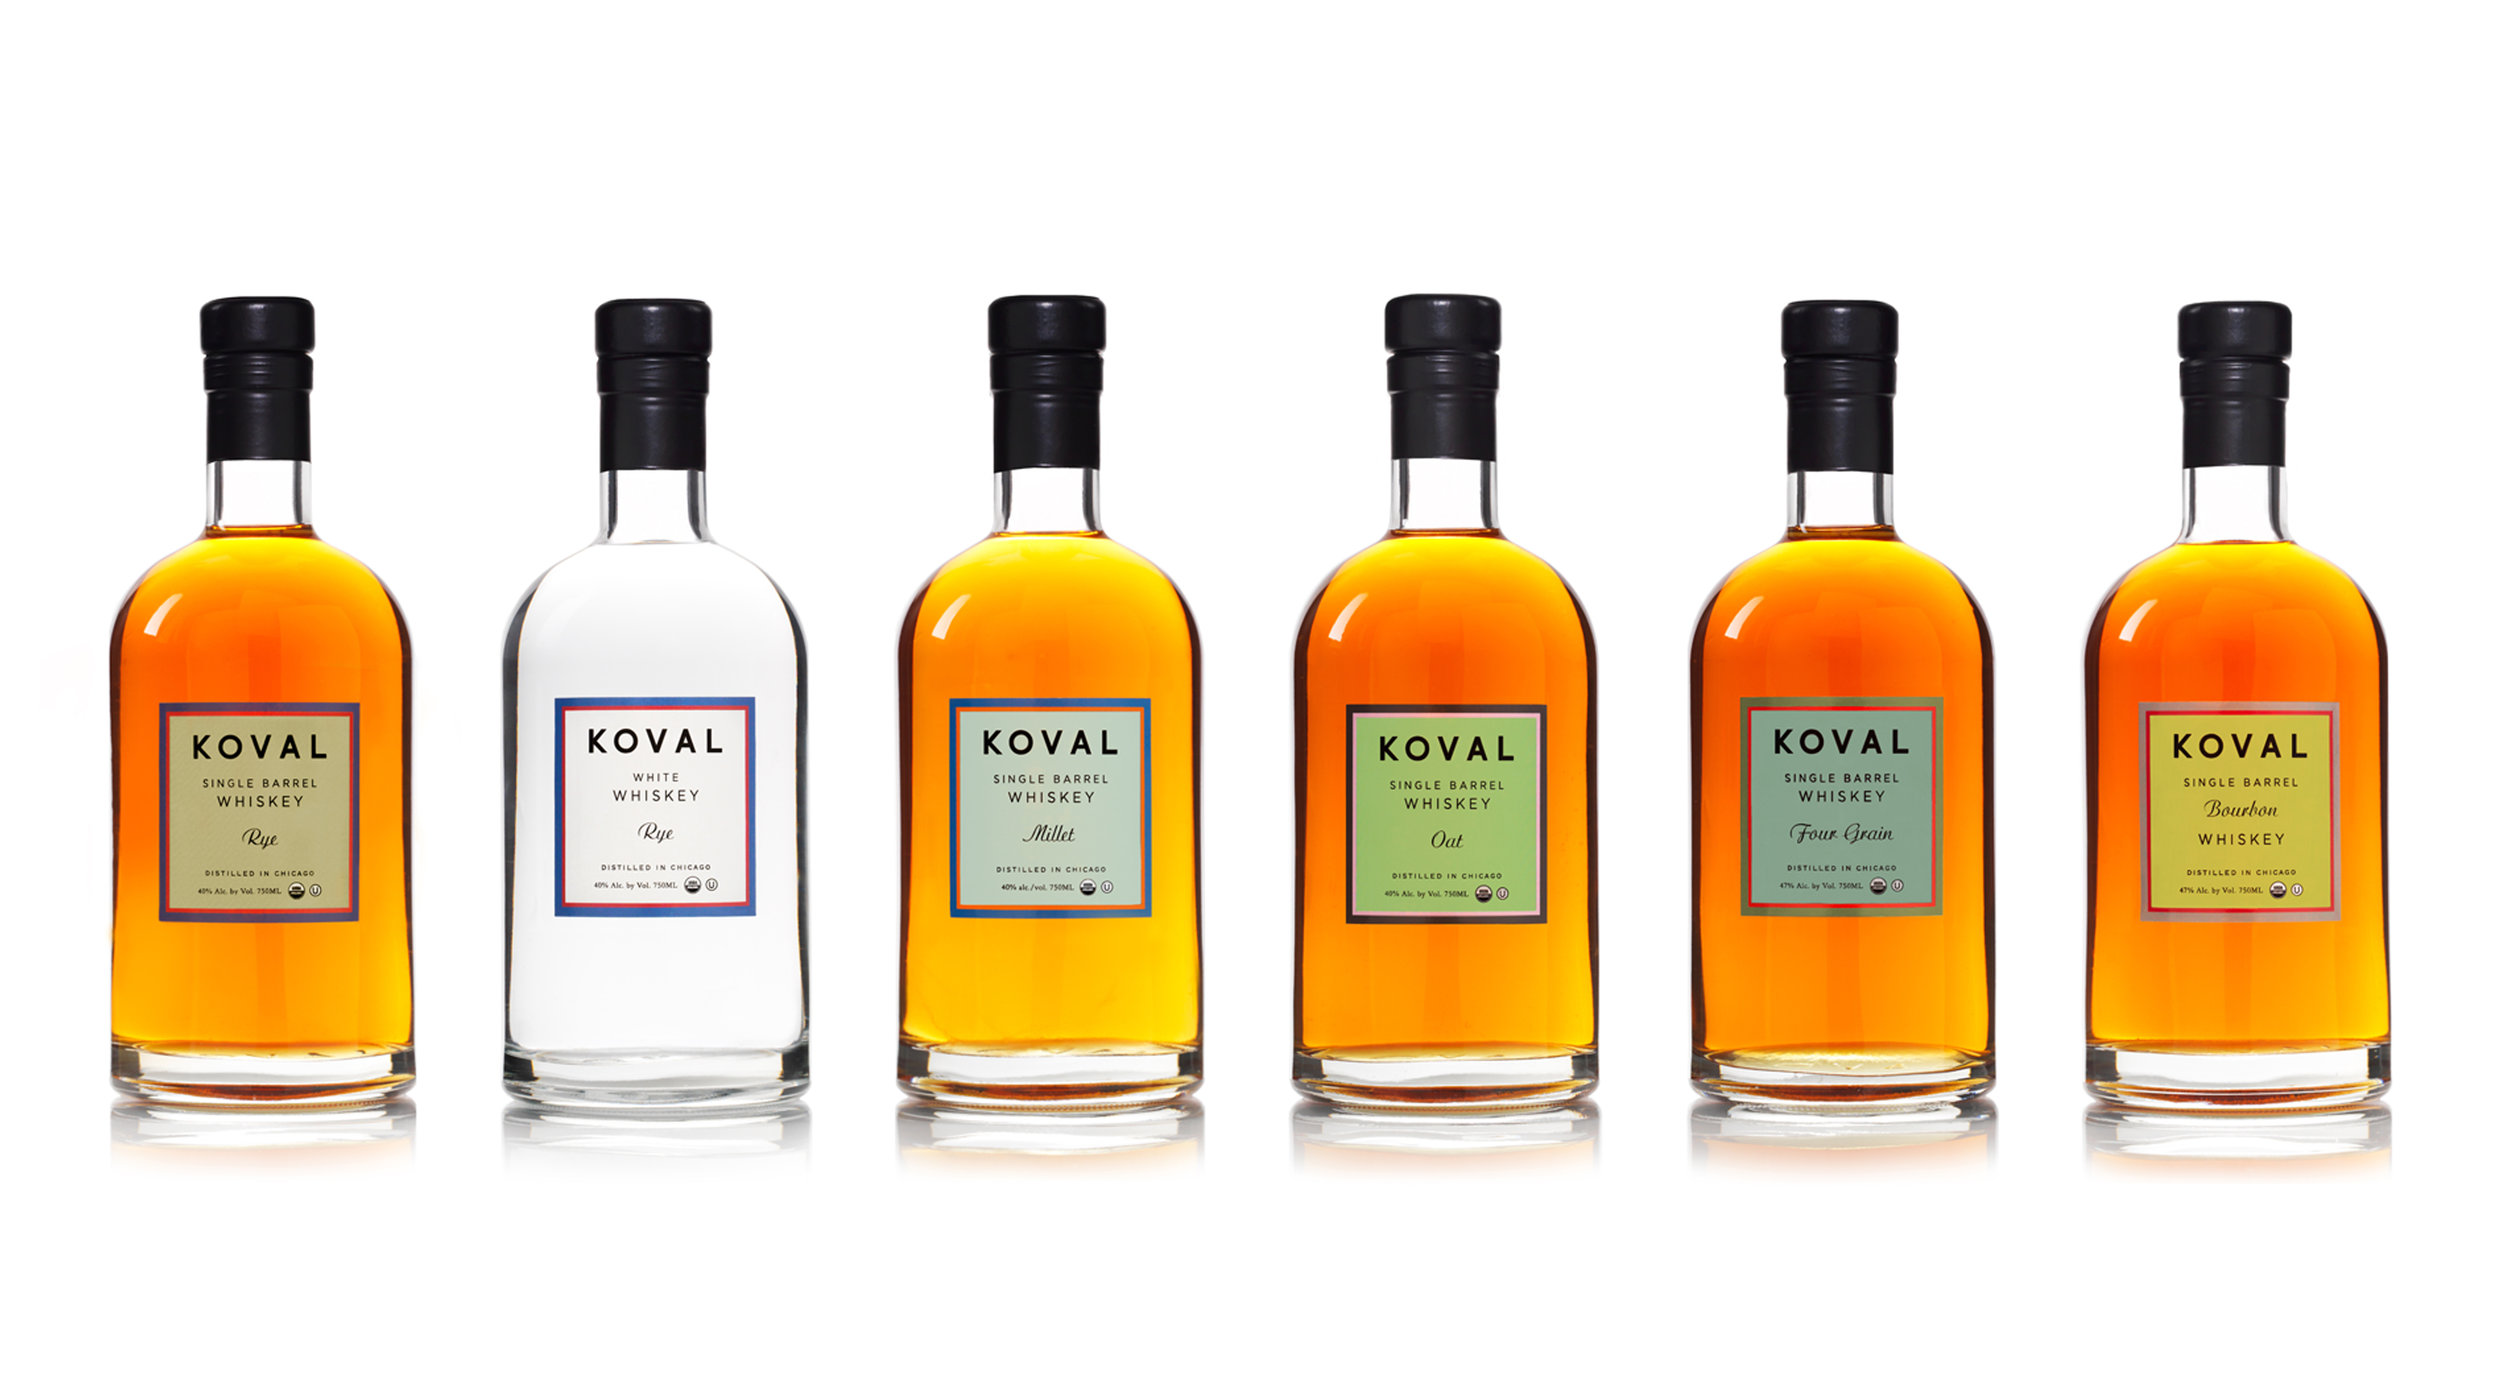 6_15_16_Koval_Whiskey_Group.jpg